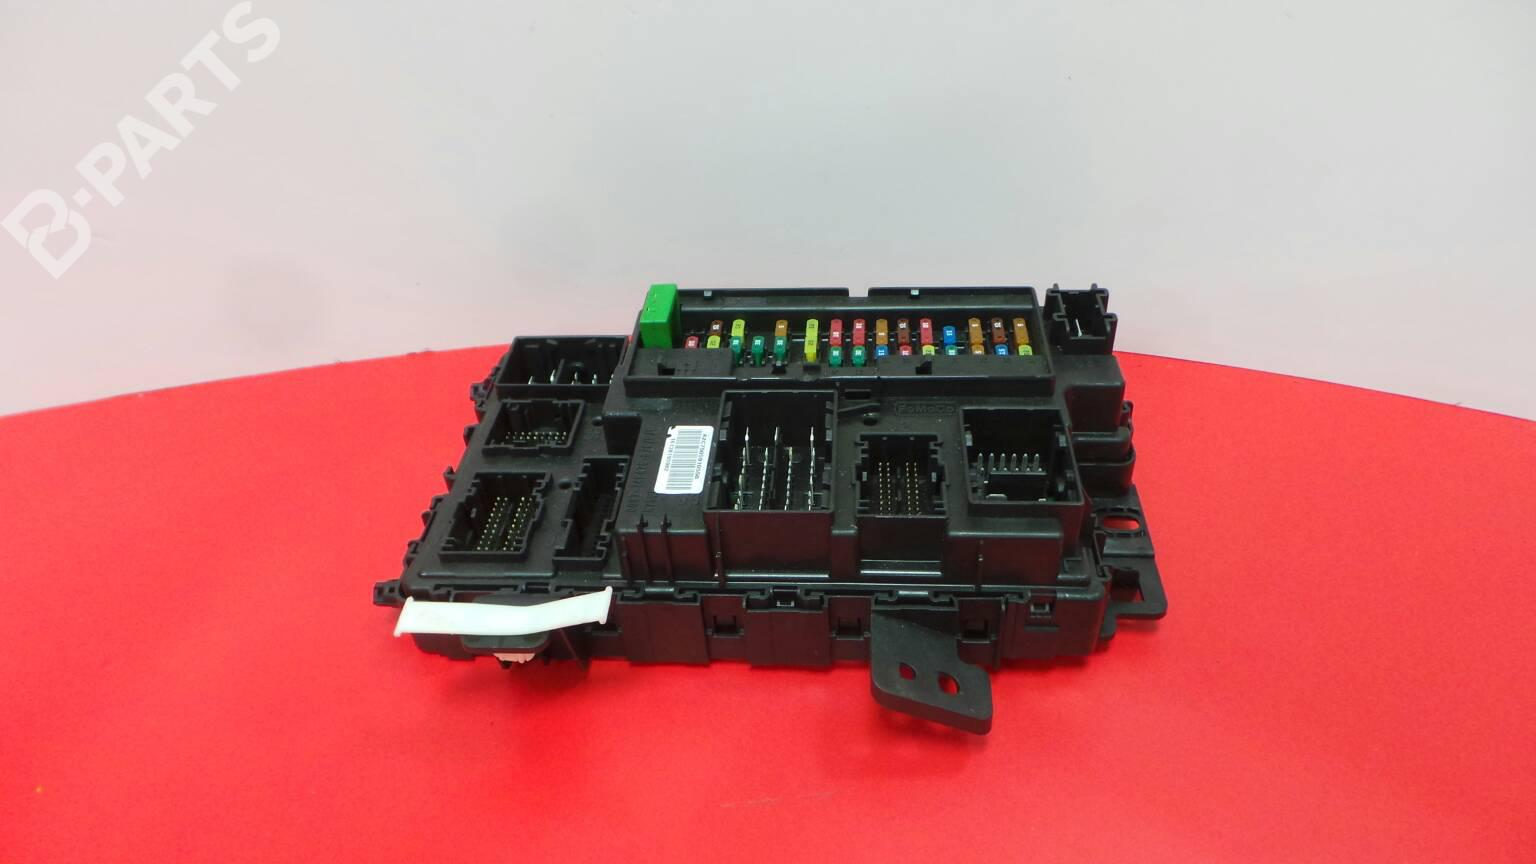 hight resolution of fuse box gk2t 15604 a2c7505910550 ford transit custom box 2 0 tdci 5